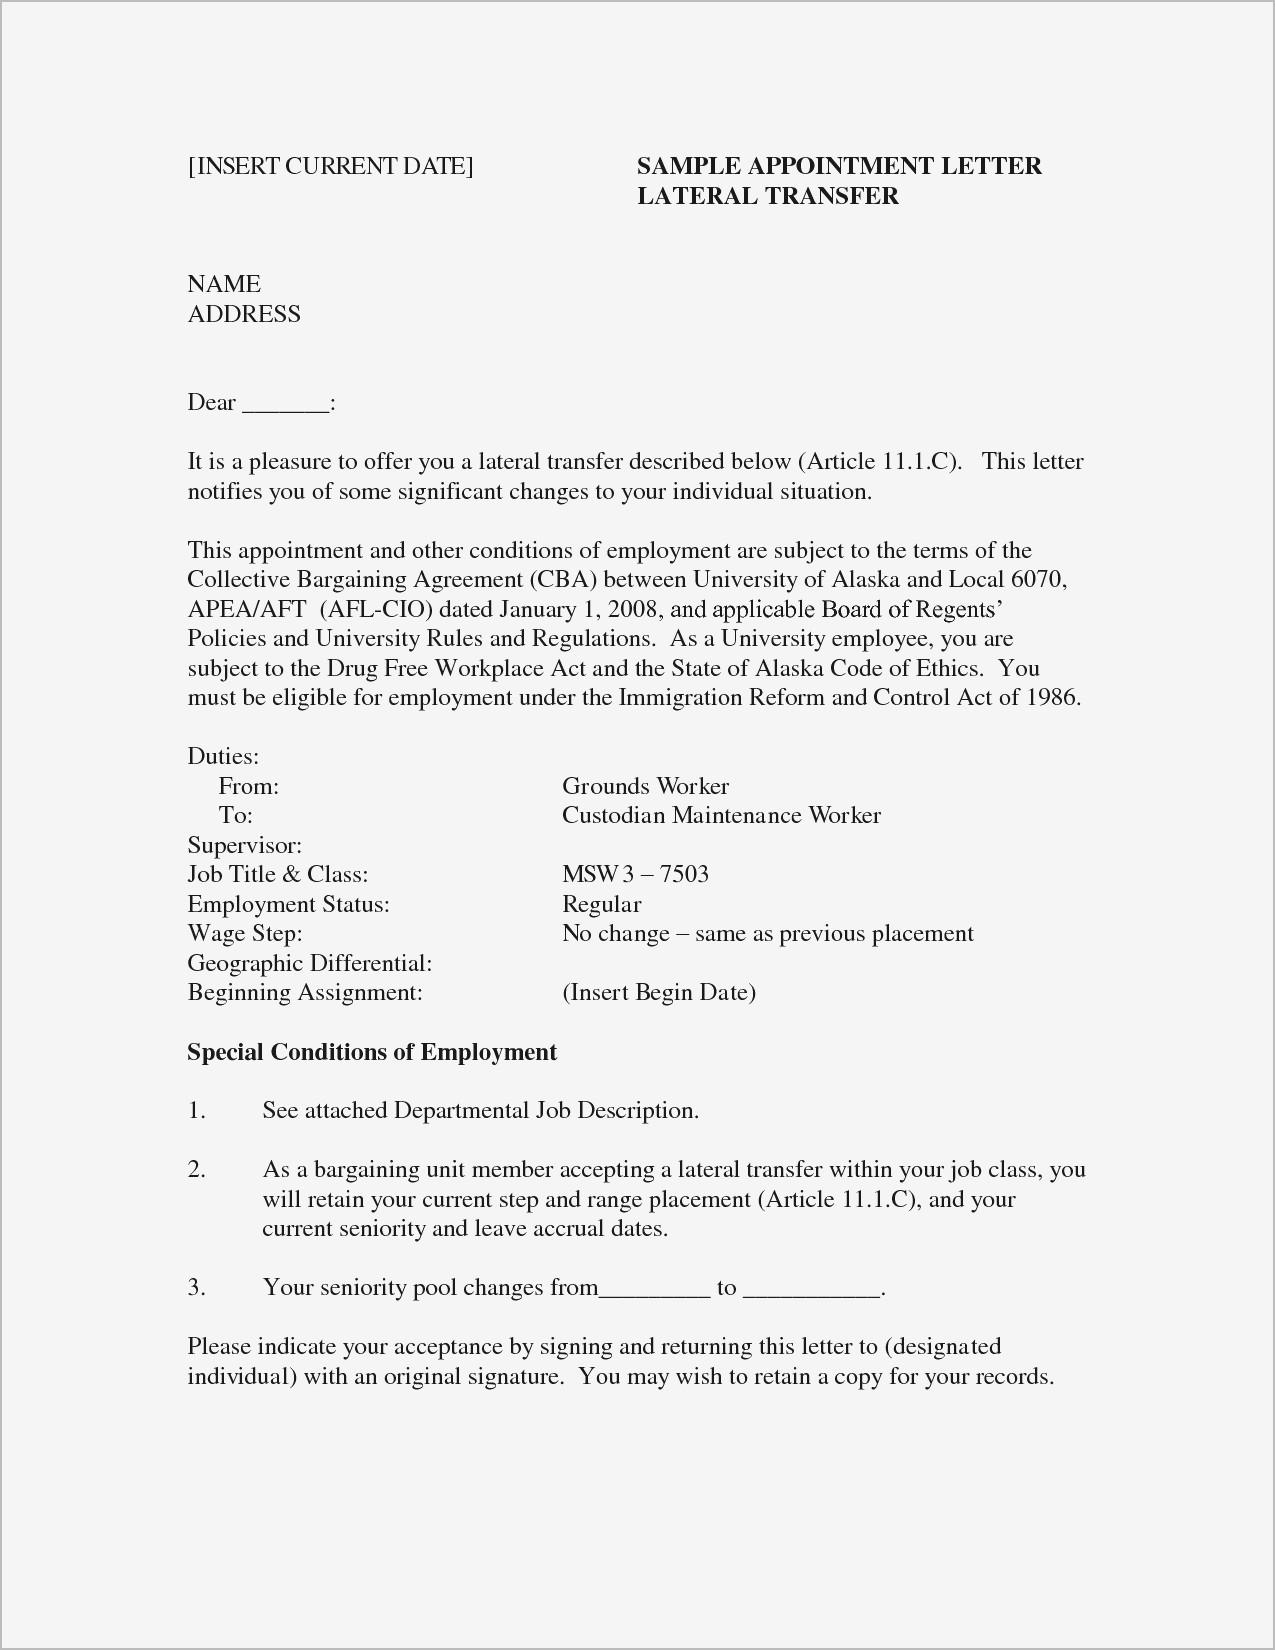 Employment Acceptance Letter Template - Job Fer Acceptance Letter Inspirationa Job Fer Letter Template Us